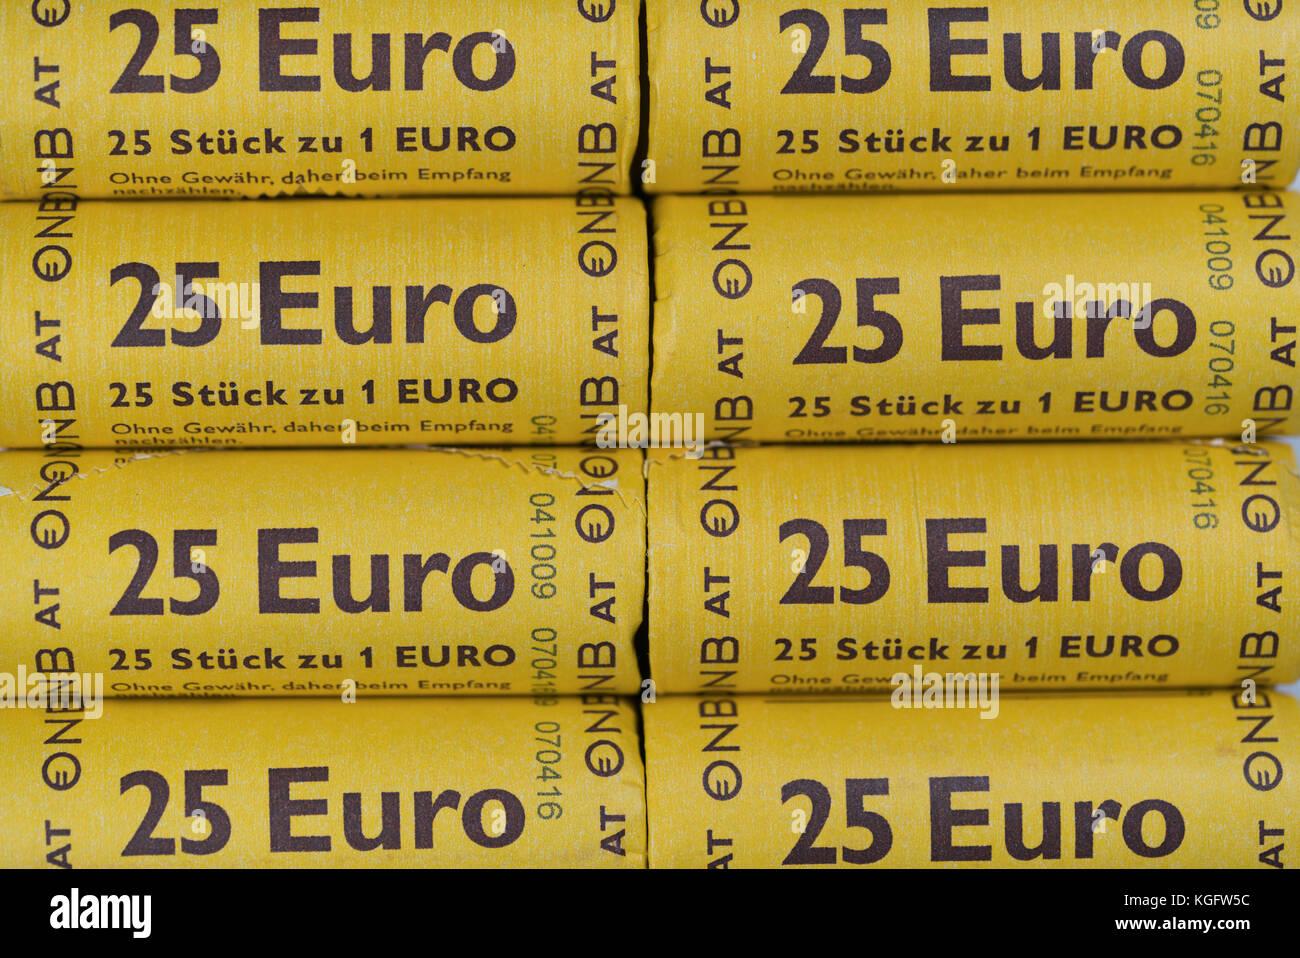 Bar, Montenegro - 26 September 2017: twenty-five euro sticks of one euro coins - Stock Image